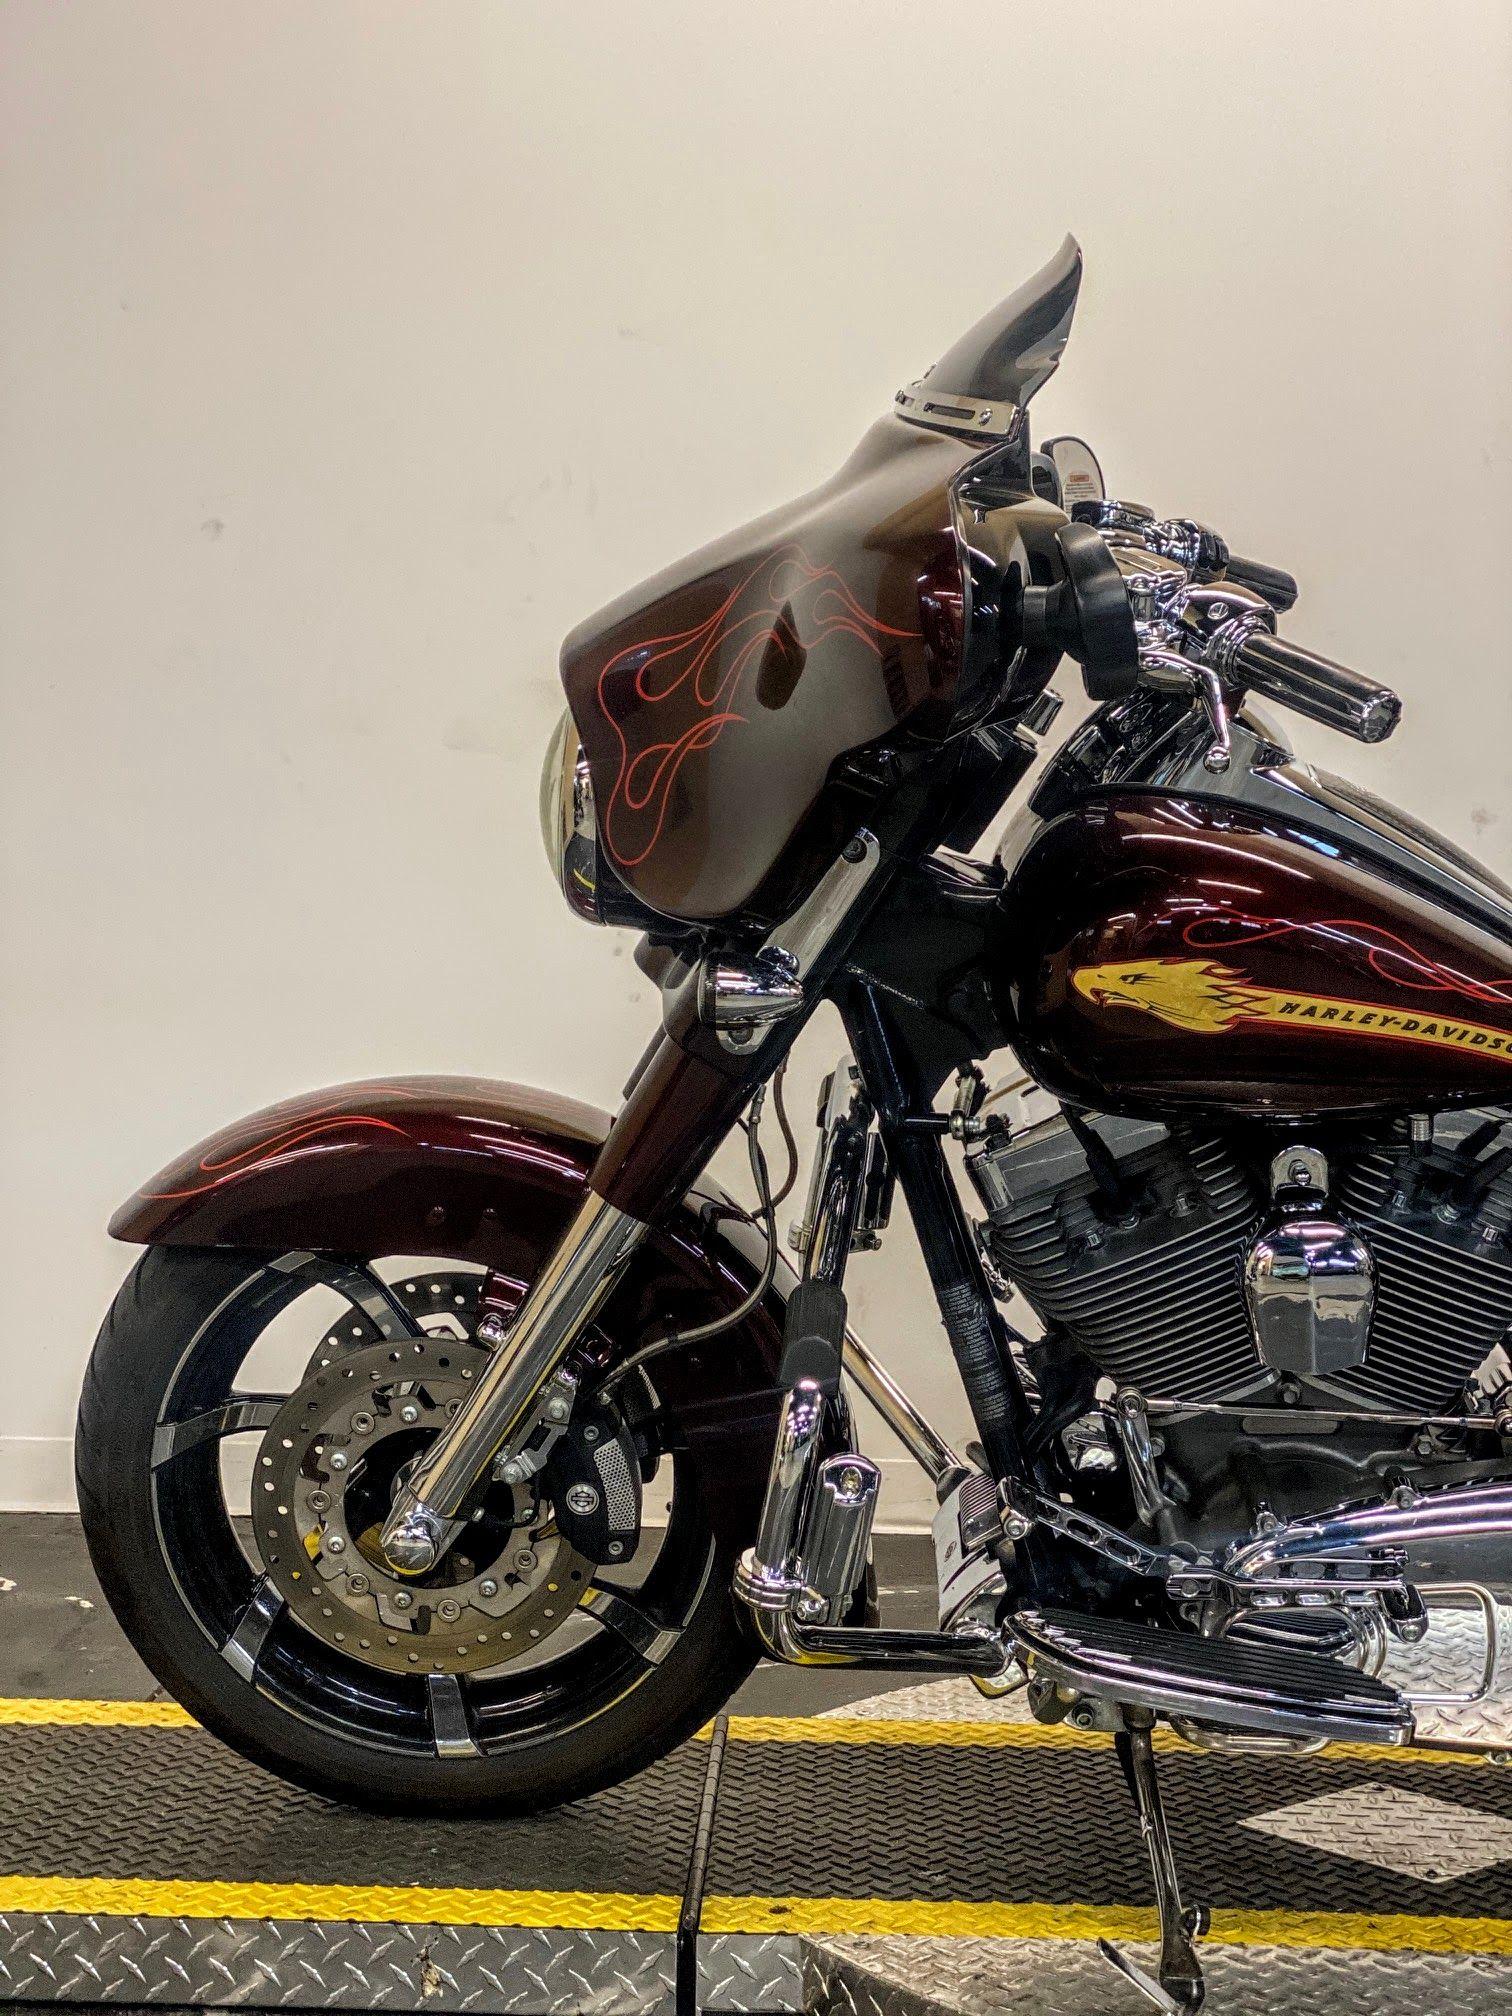 Pre-Owned 2010 Harley-Davidson CVO Street Glide FLHXSE